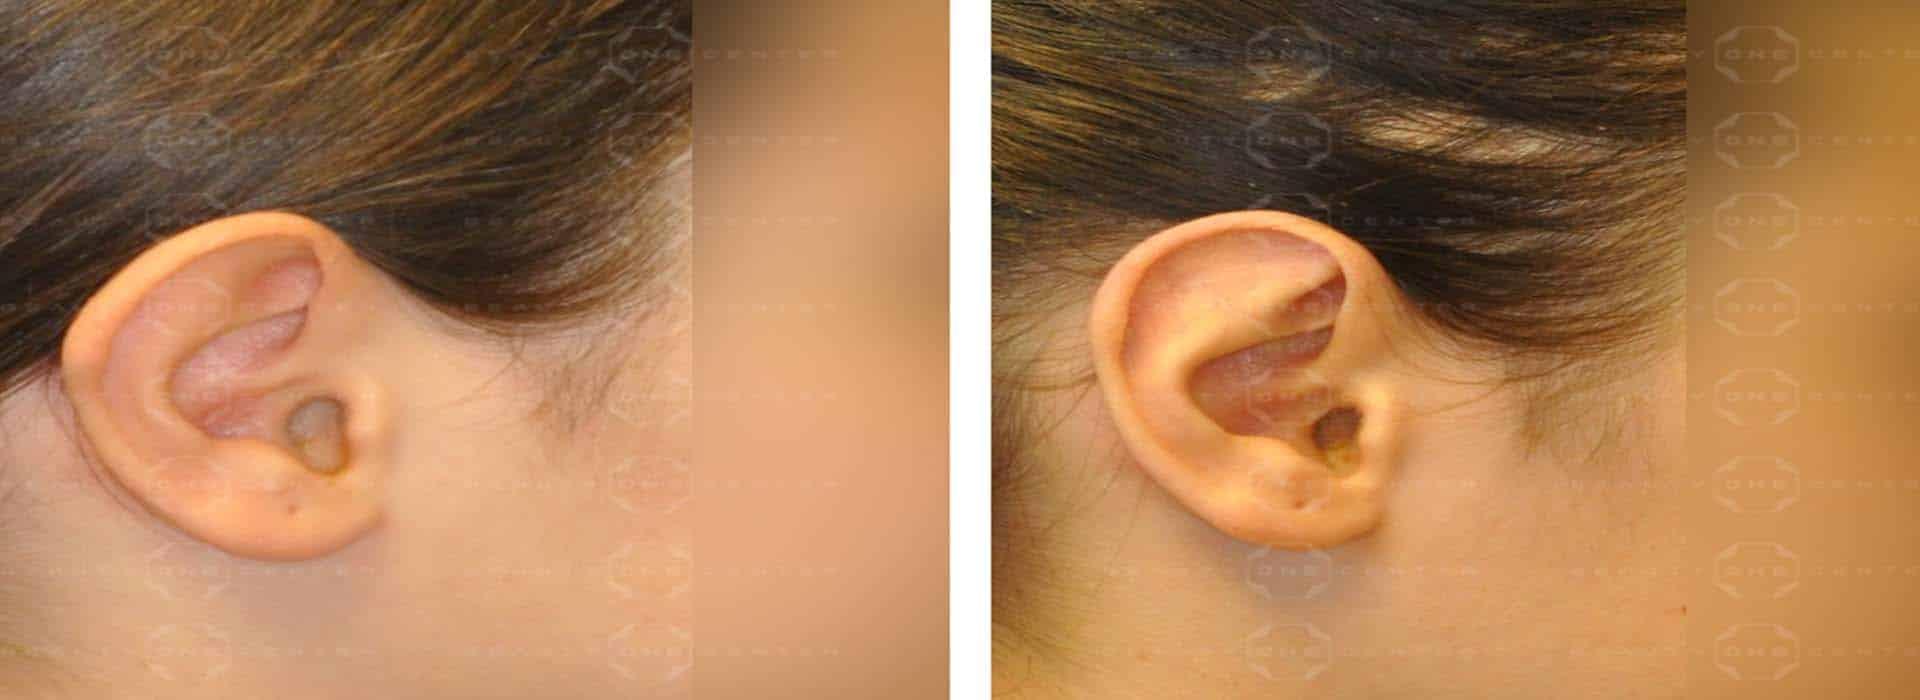 Postoperatorio de la otoplastia u operación de orejas